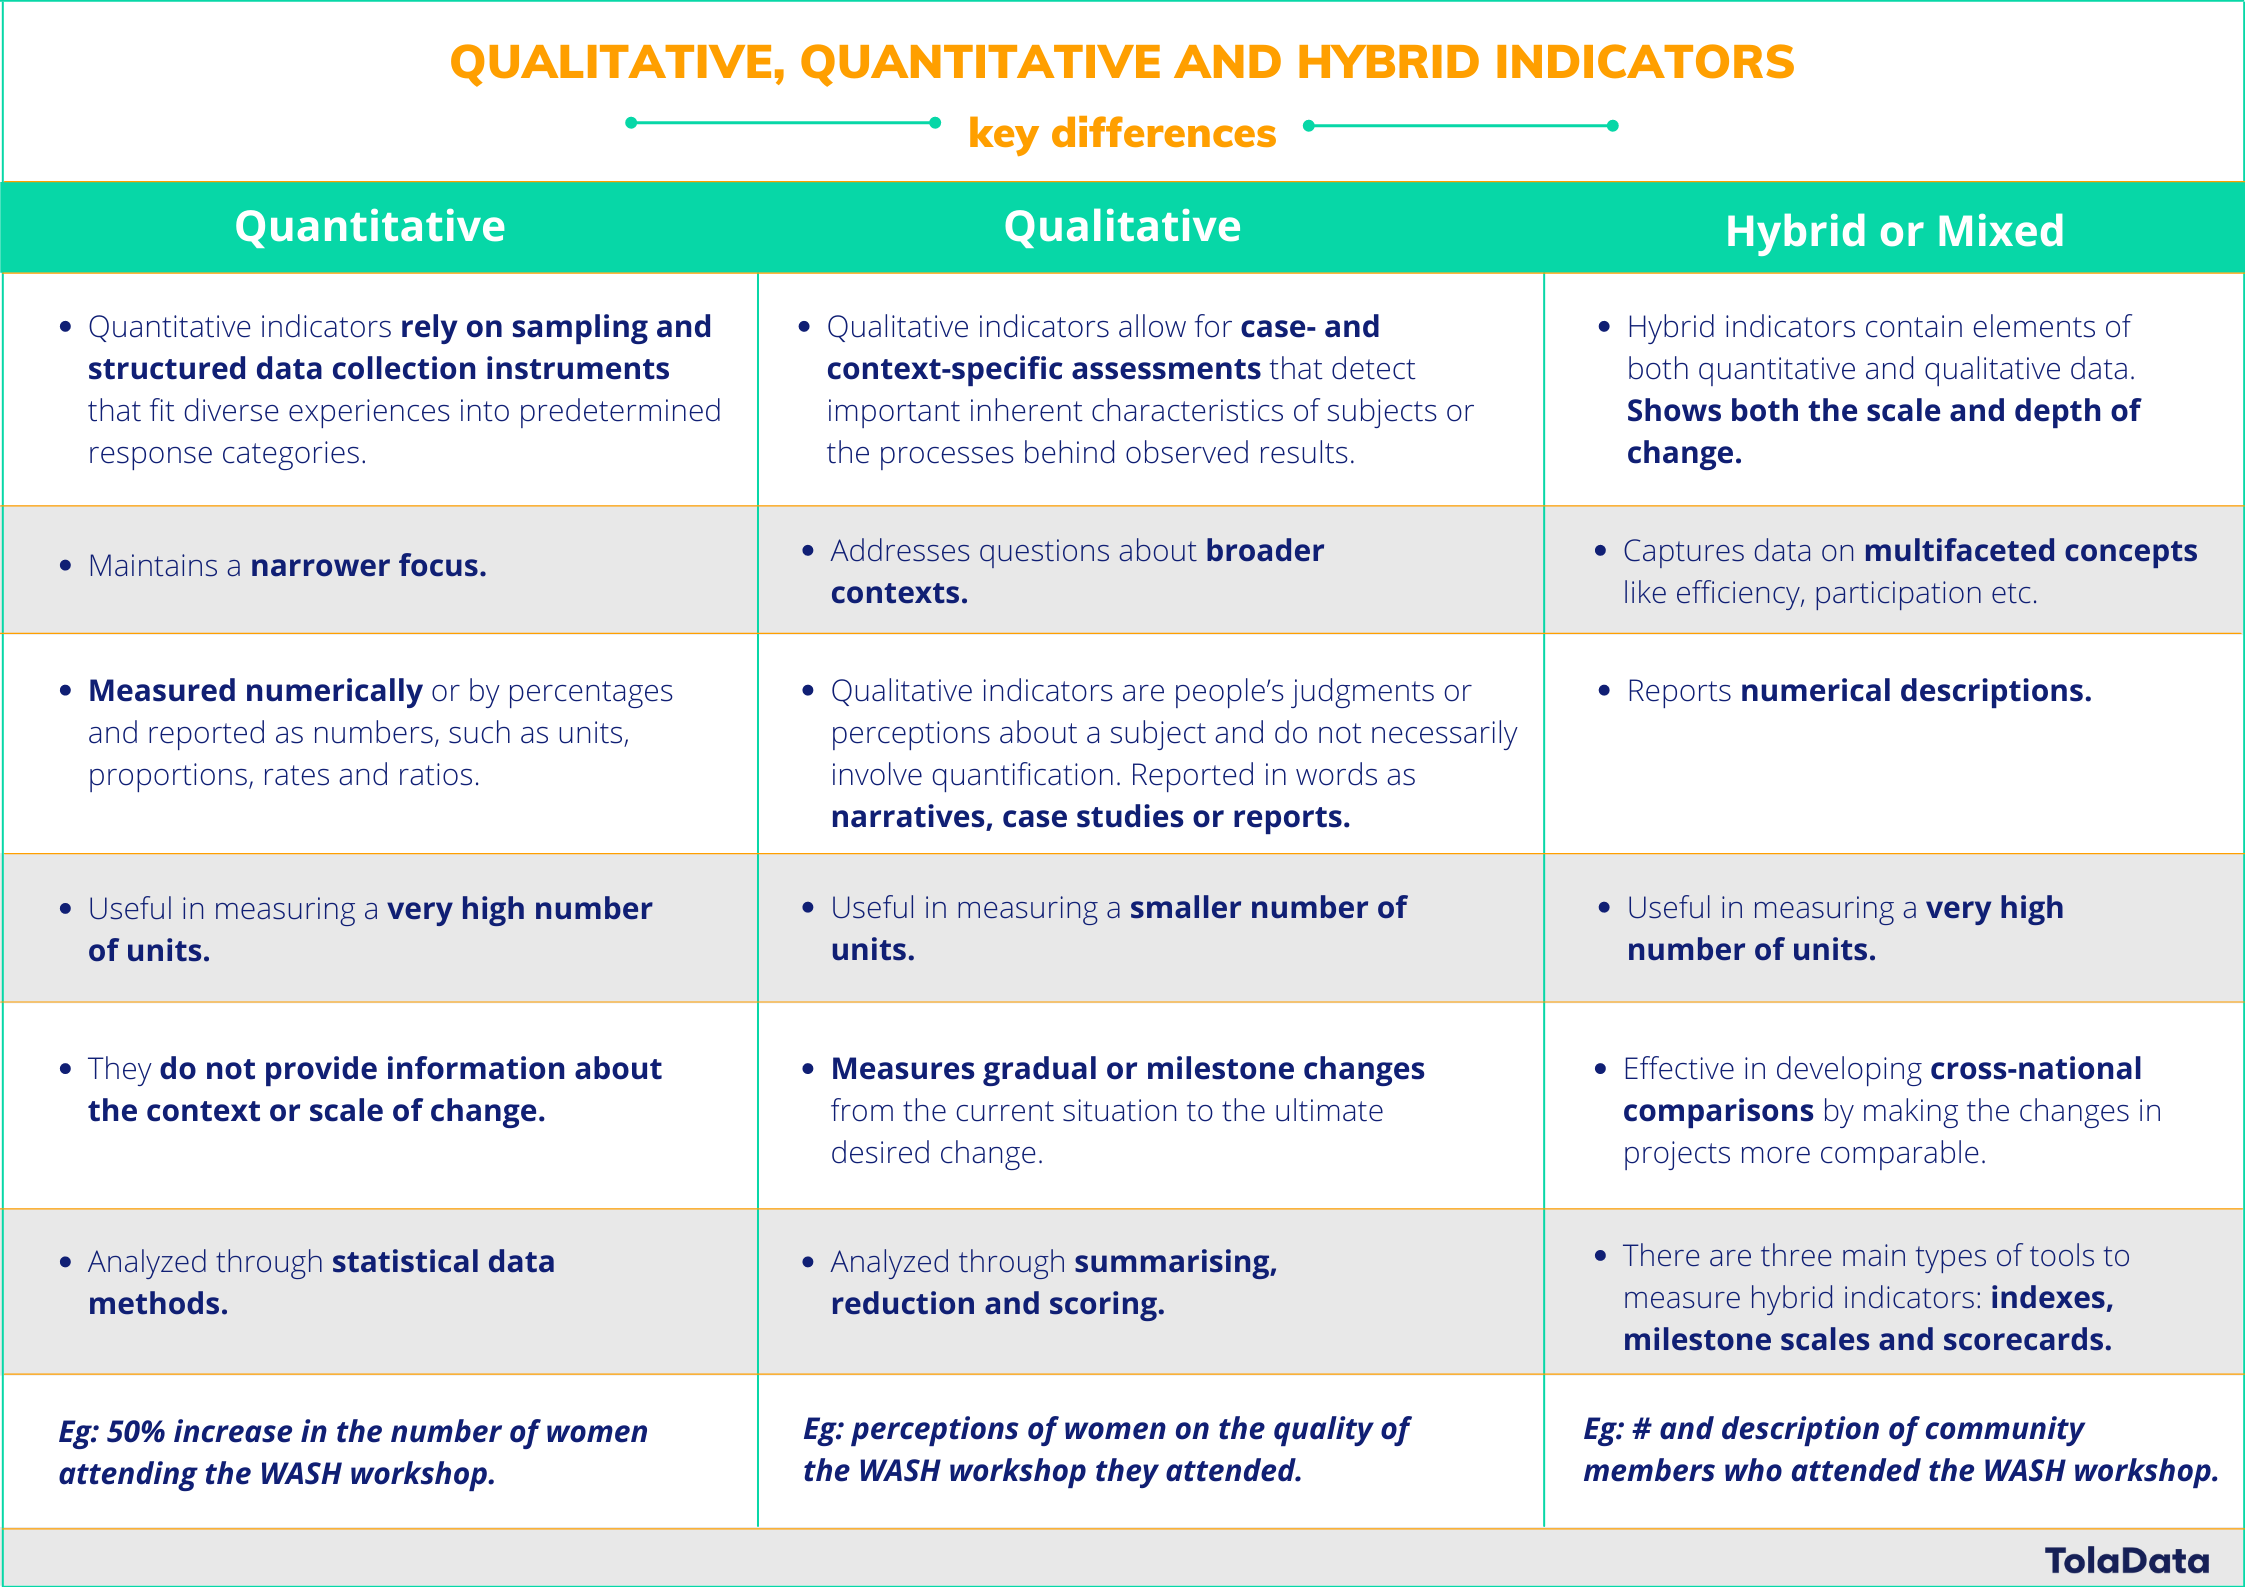 qualitative, quantitative and hybrid indicators, key differences